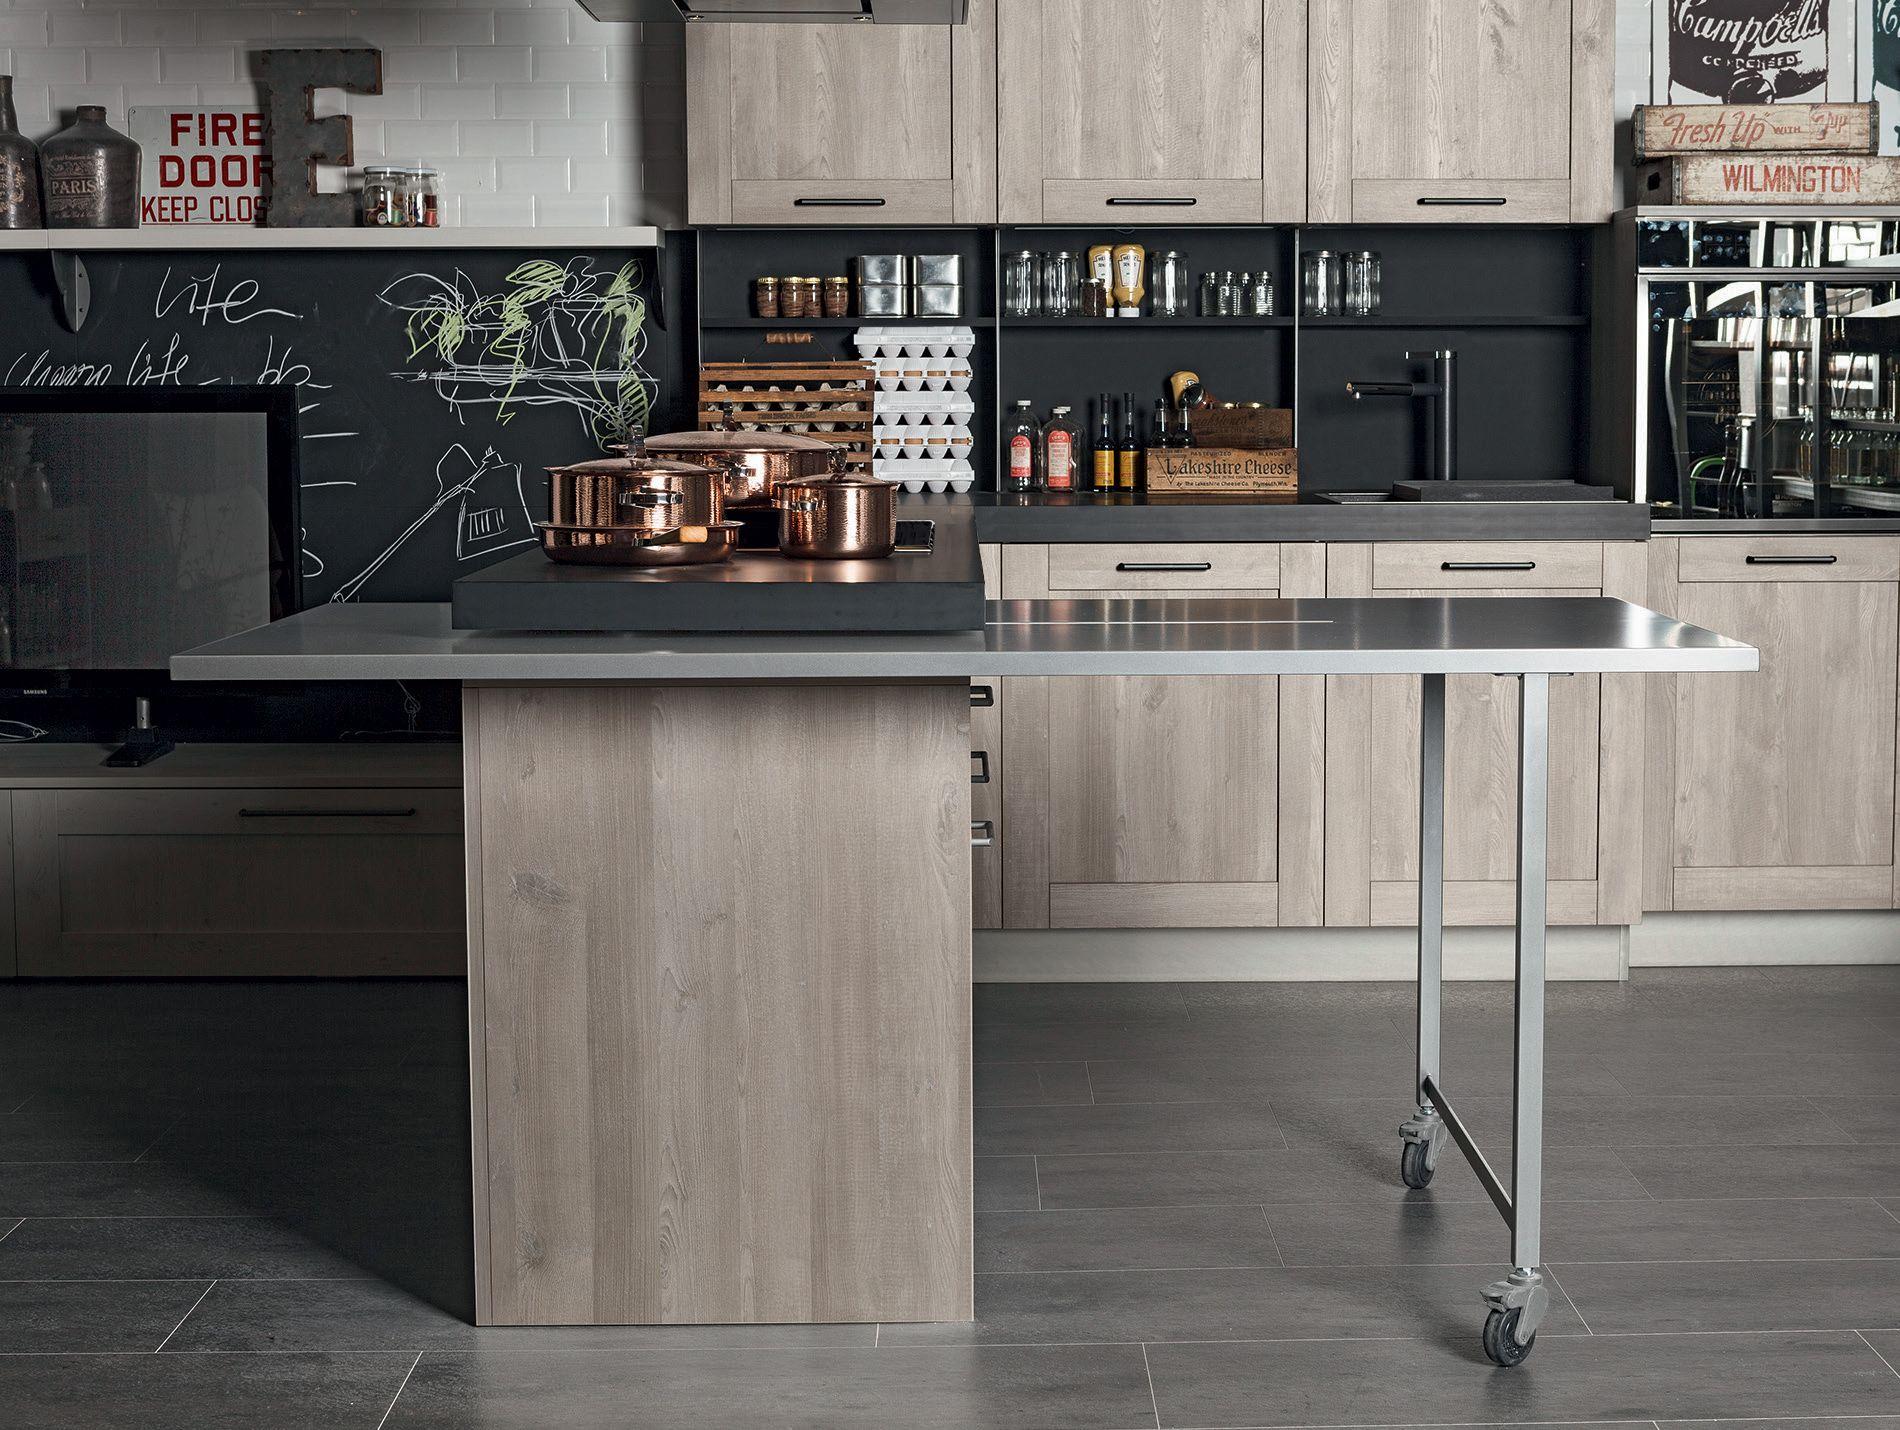 Dettaglio cucina moderna stosa modello cucina city 01 - Cucina city stosa ...